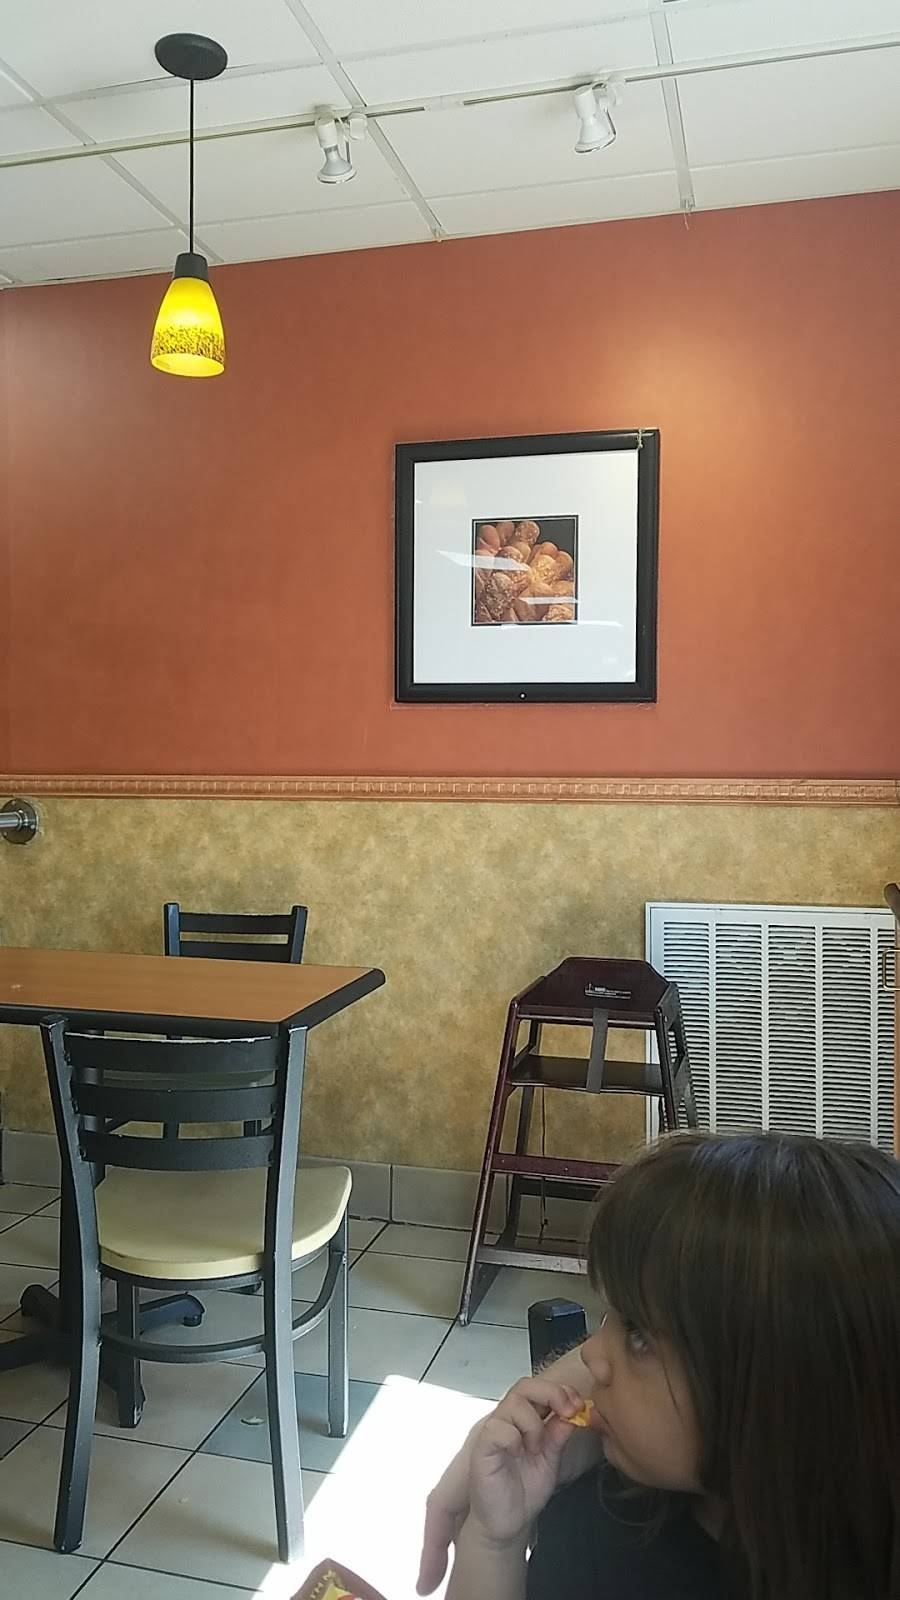 Subway Restaurants 400 York Rd Towson Md 21204 Usa